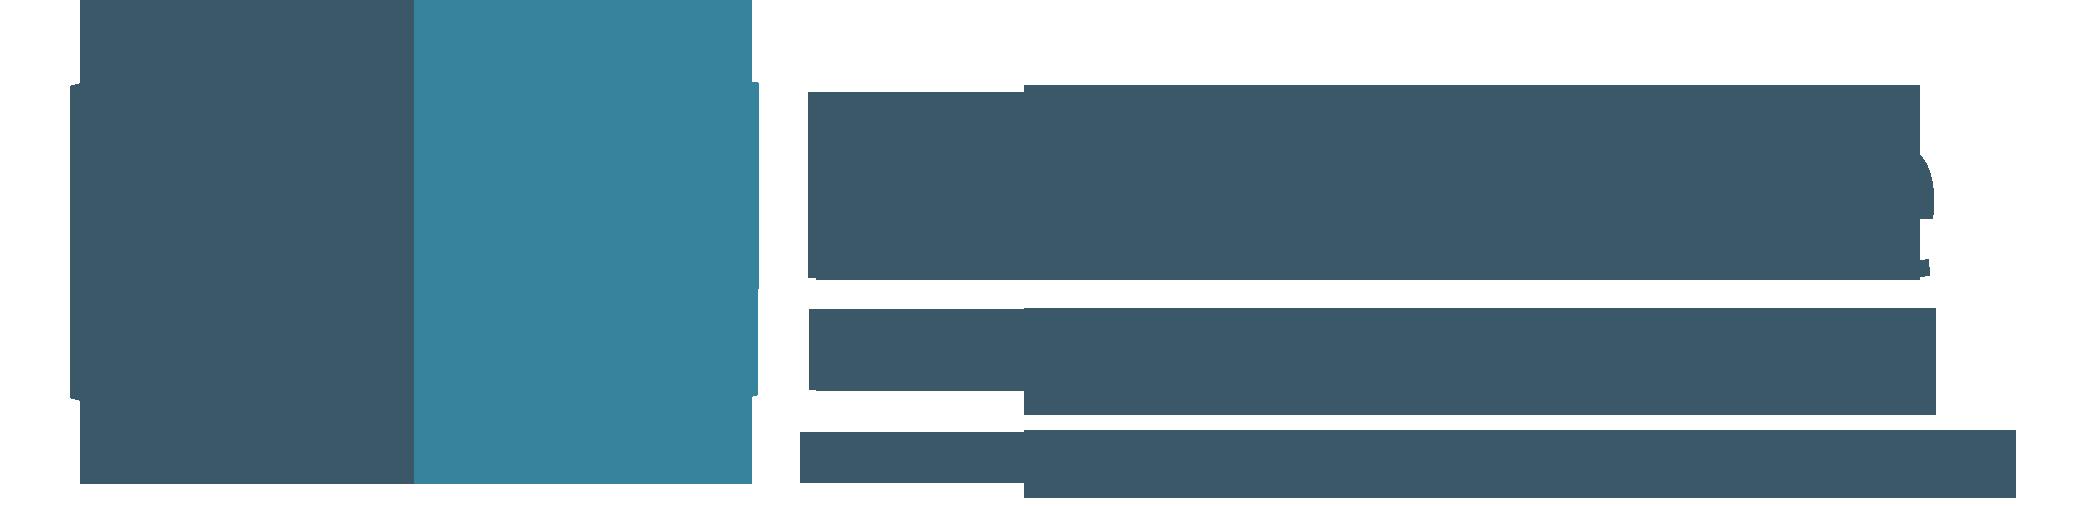 Hardcastle Investment Corporation